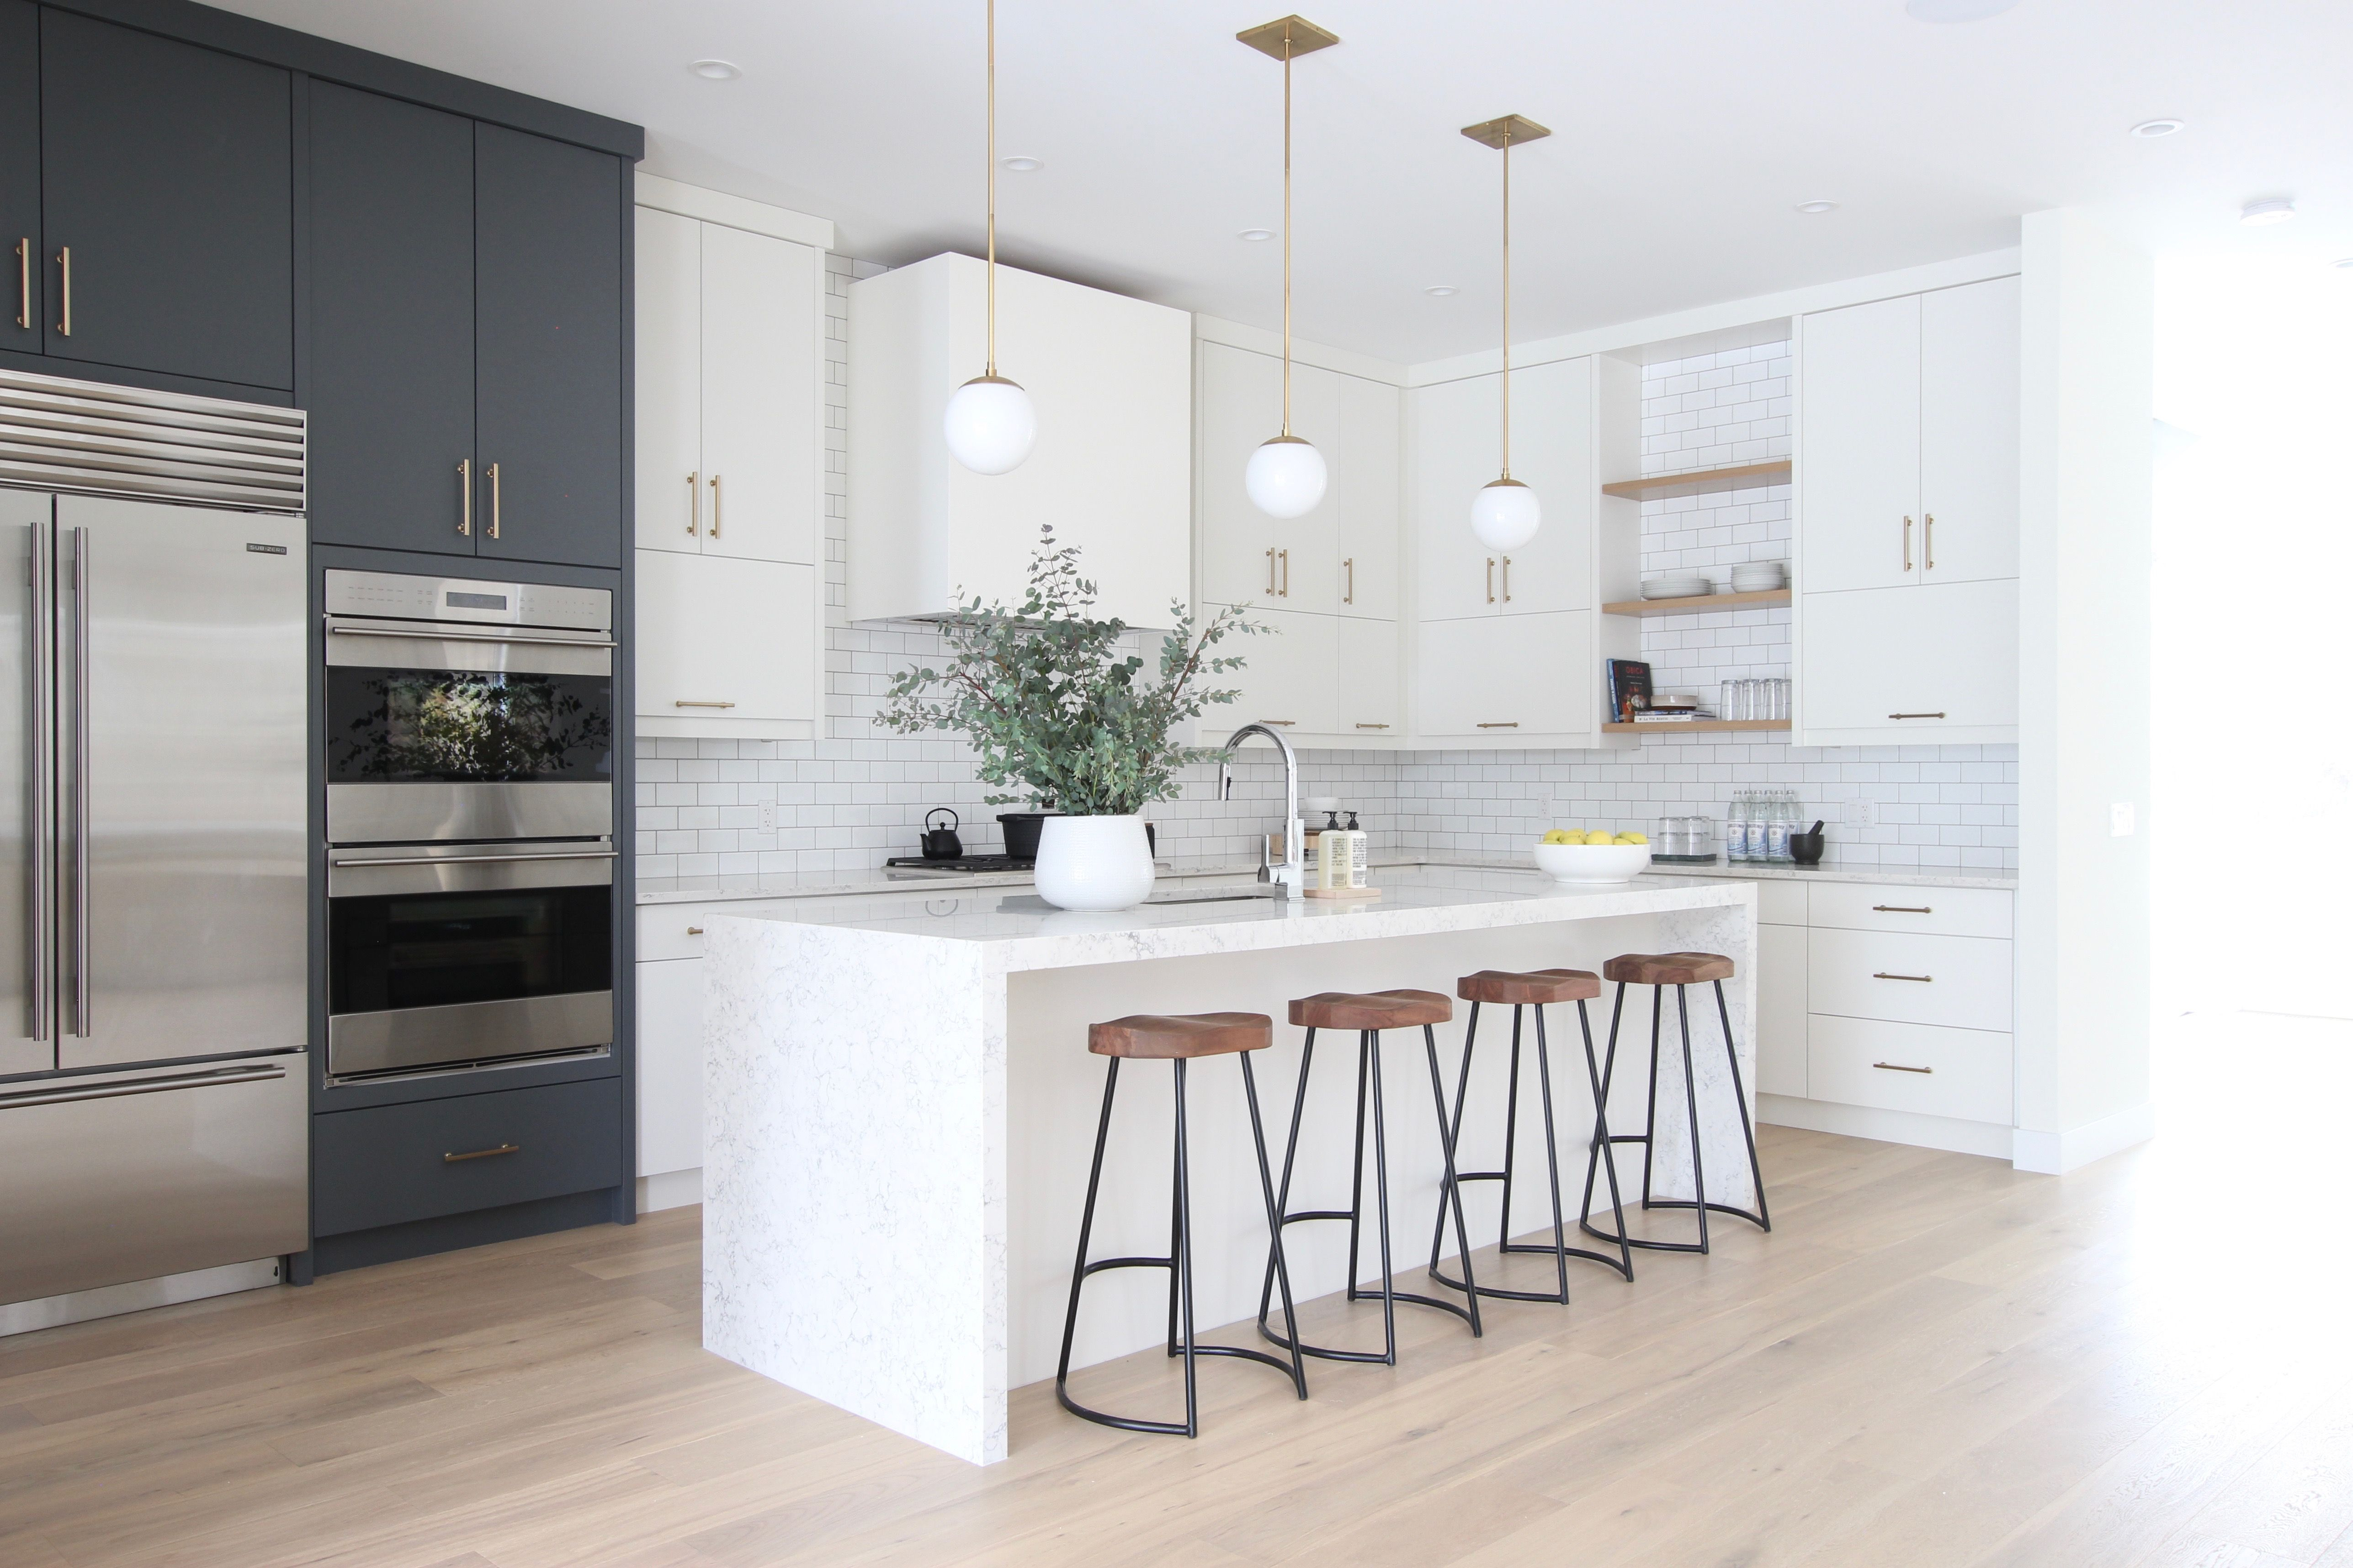 Modern Classic Project open shelving kitchen, wood